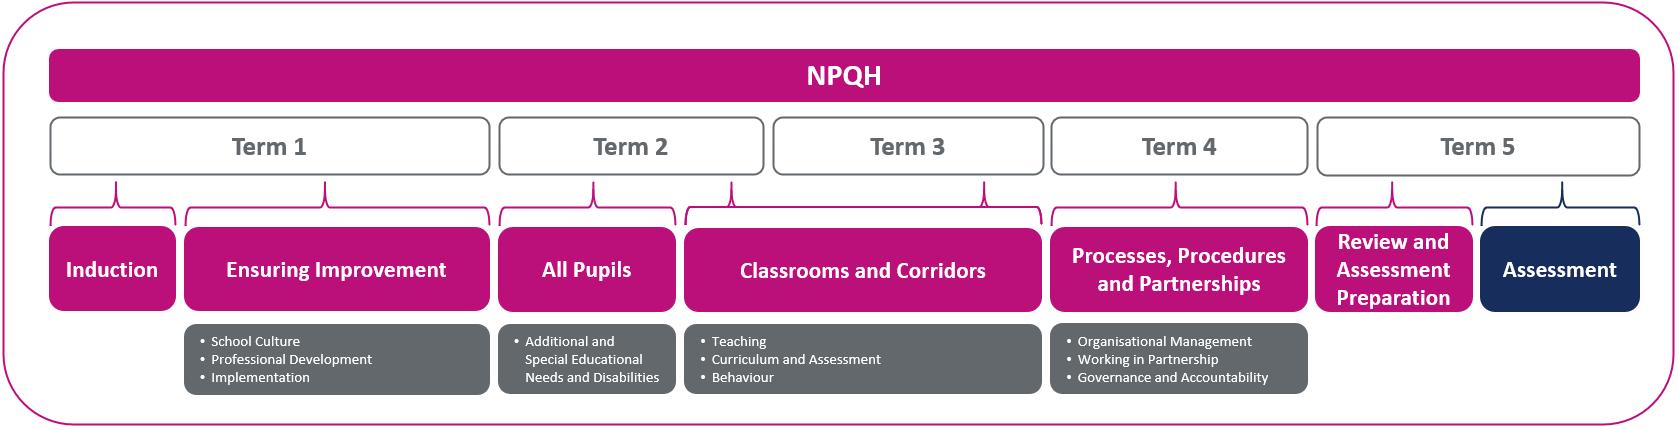 NPQH Sequence